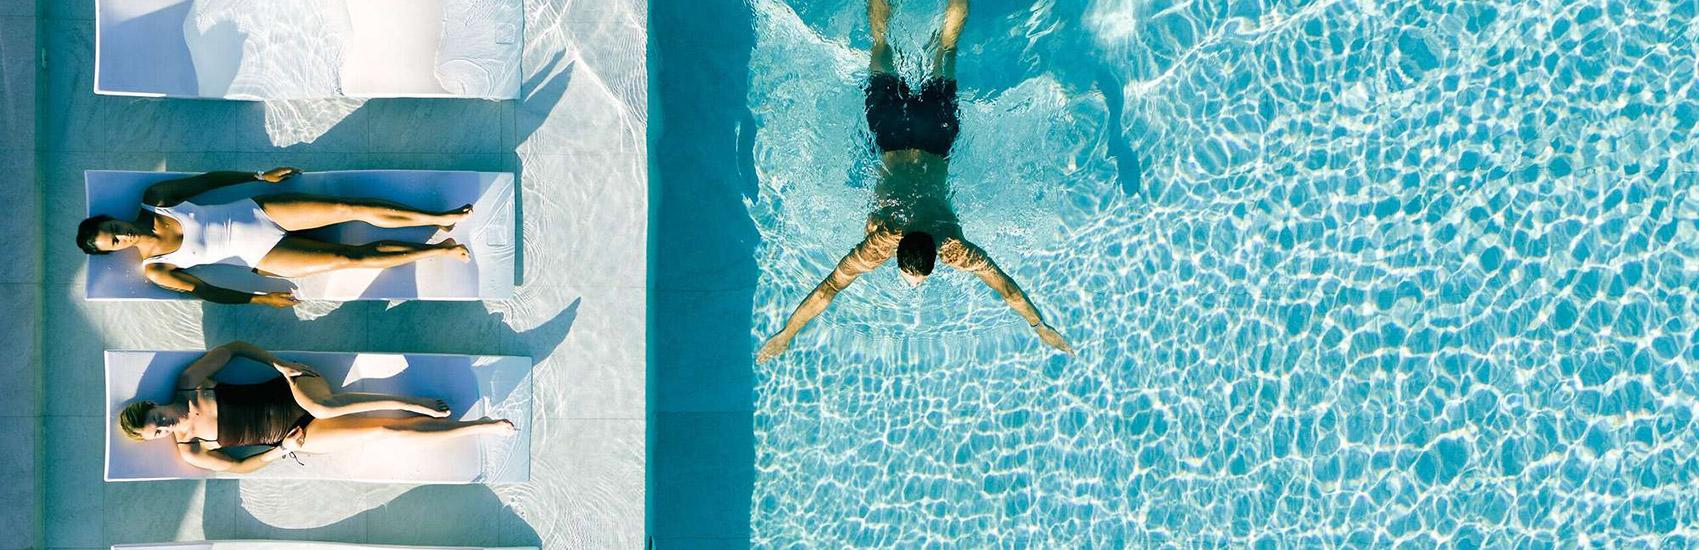 Club Med Early Booking Savings 4